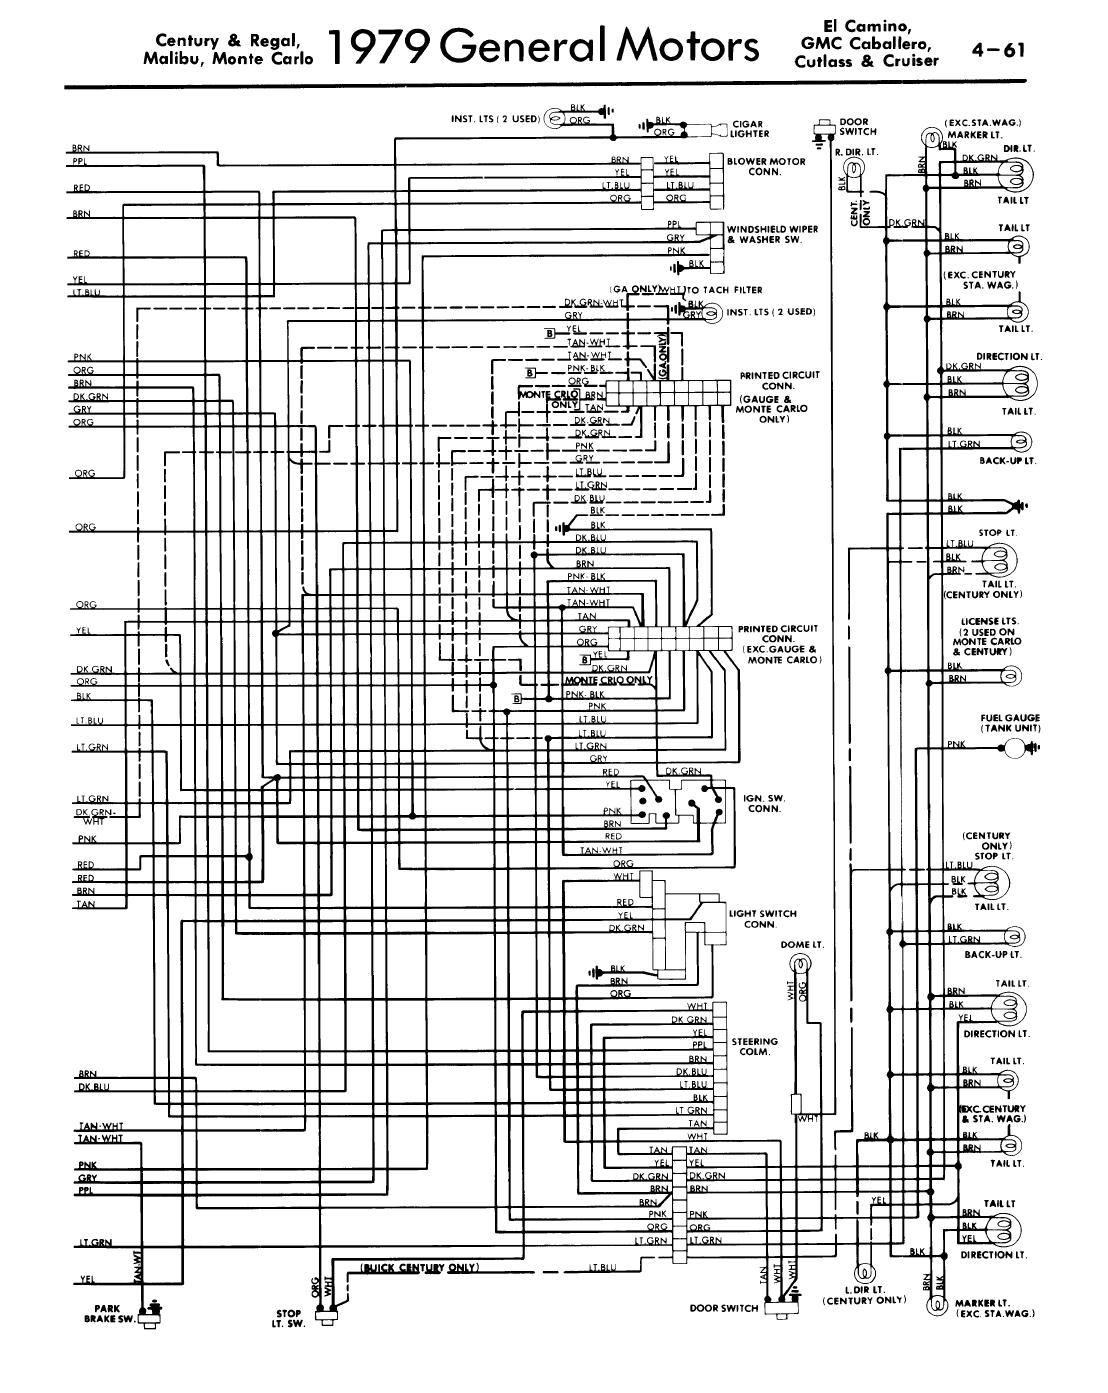 I Have A 79 Malibu Elcamino Ss With 43 4spd C What Color 1973 El Camino Wiring Diagram Graphic